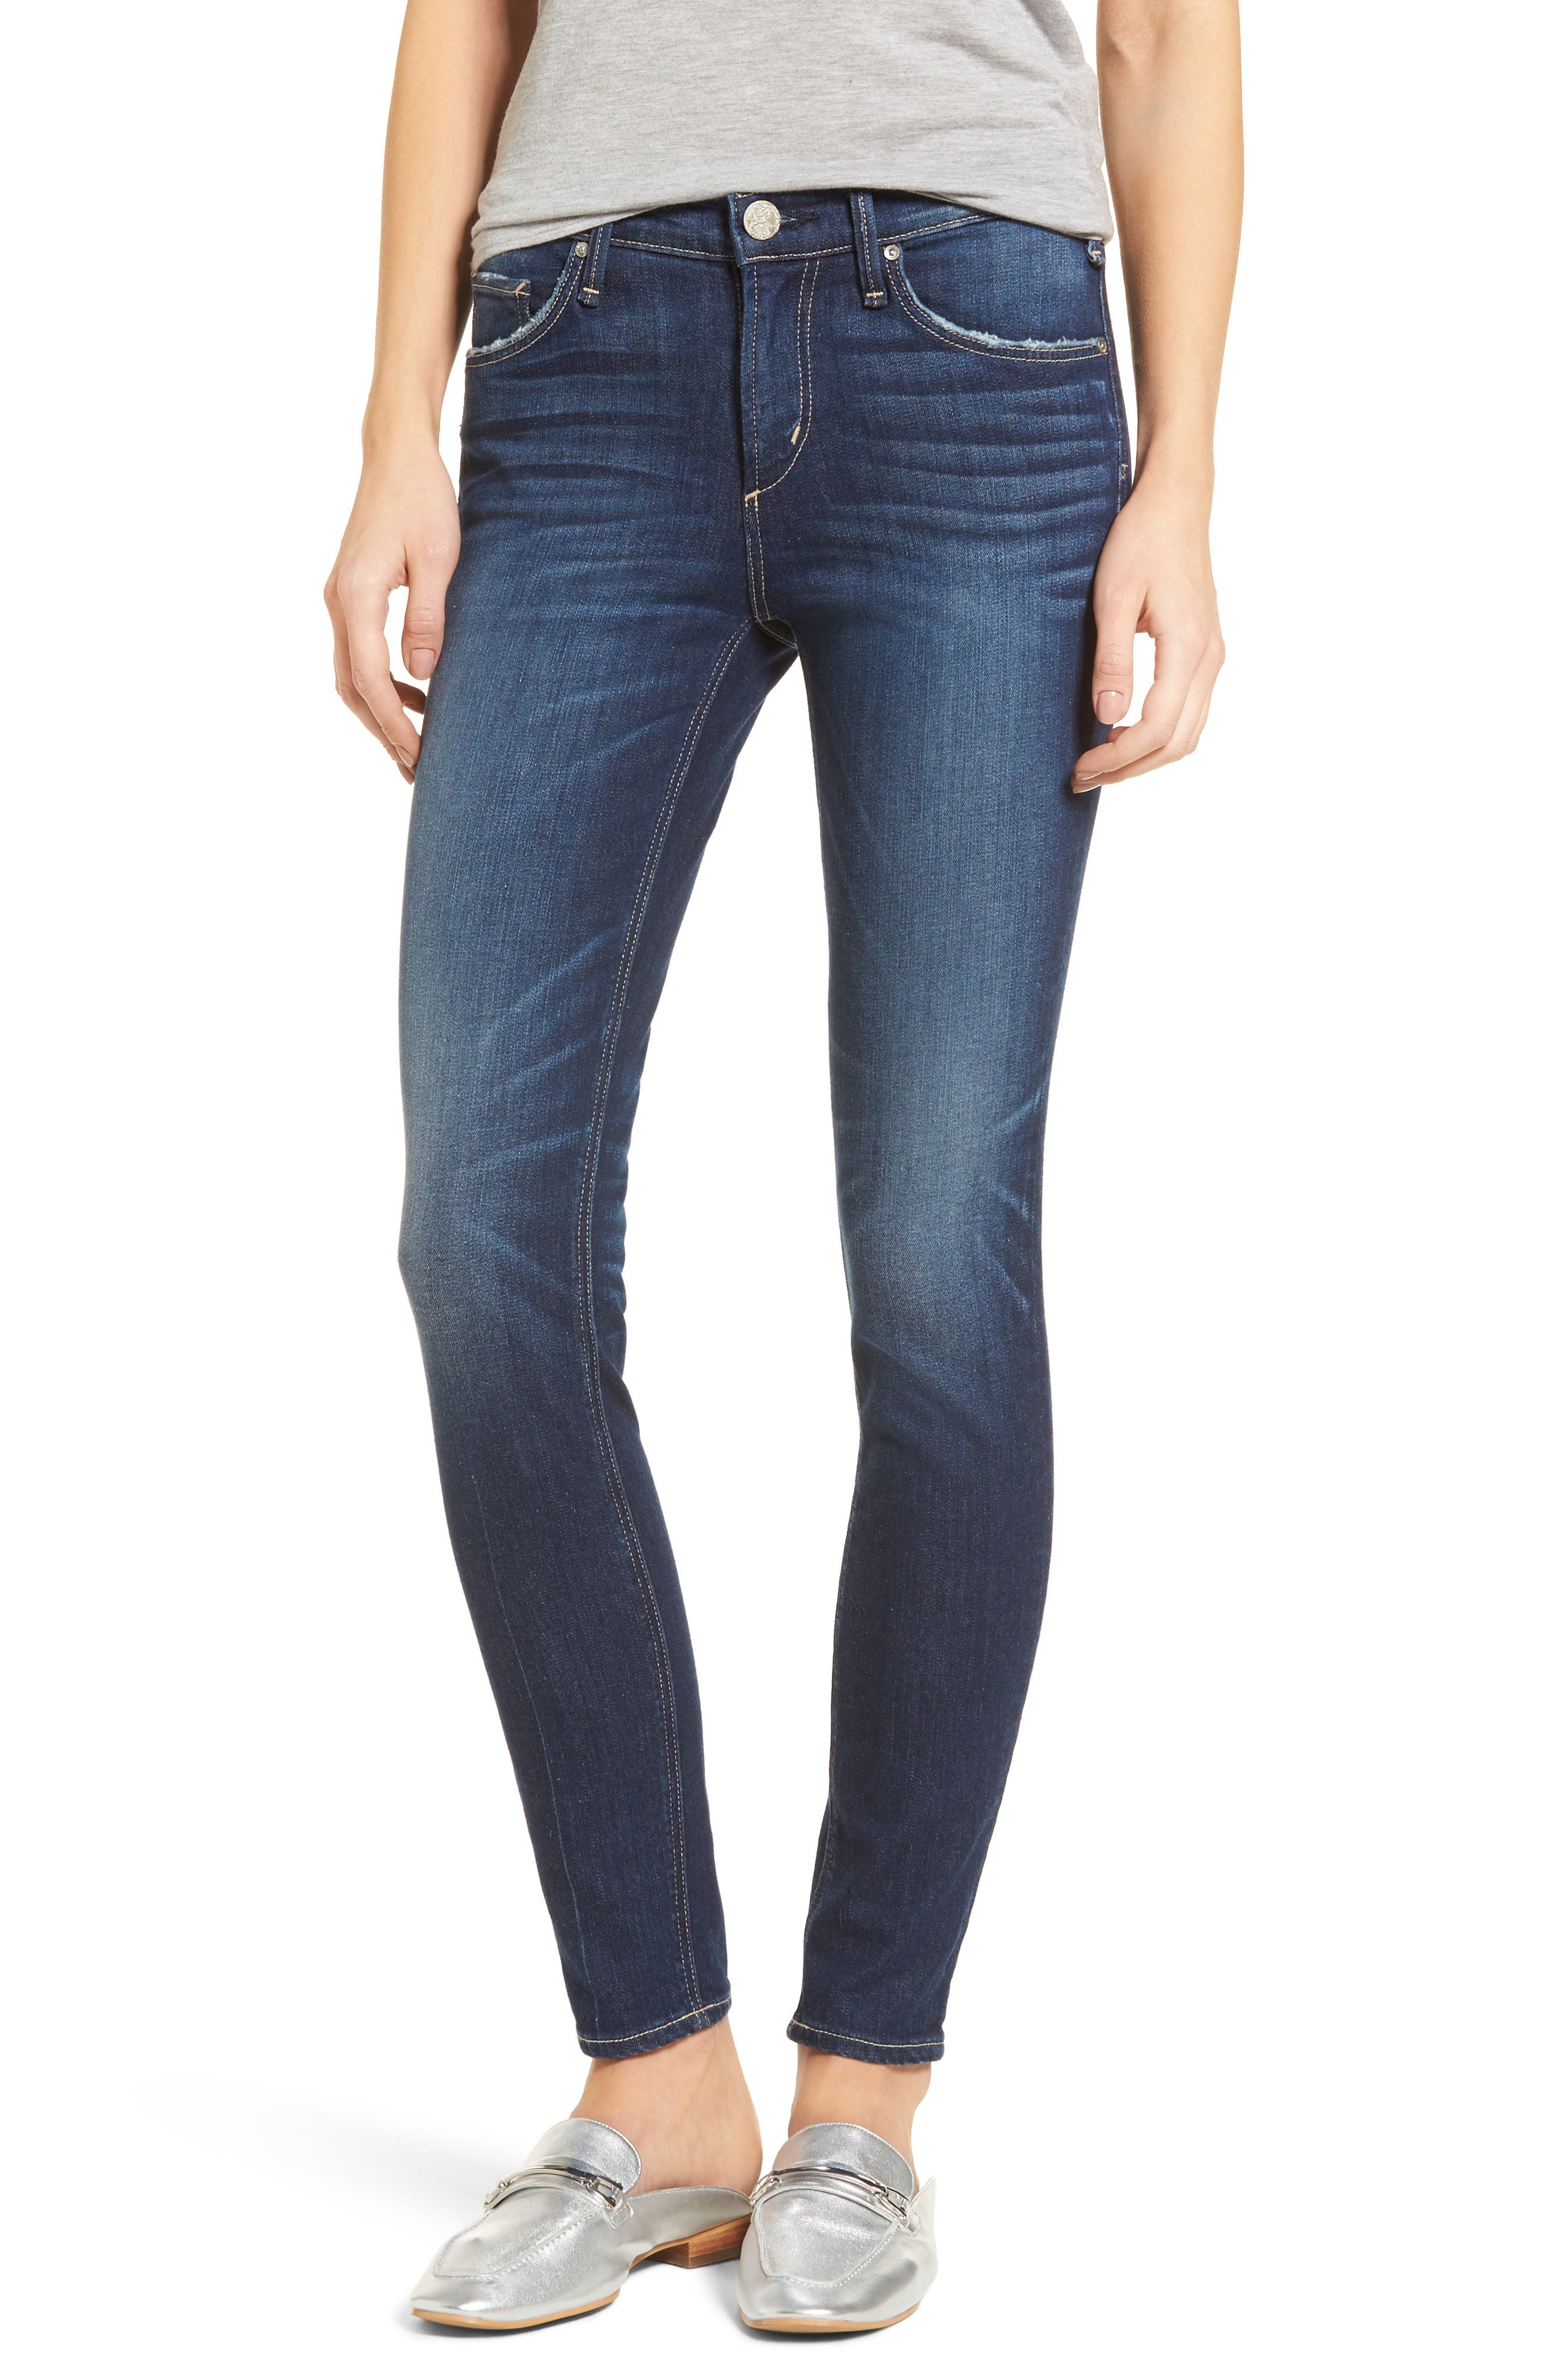 Newton Skinny Jeans,                         Main,                         color, Chateau